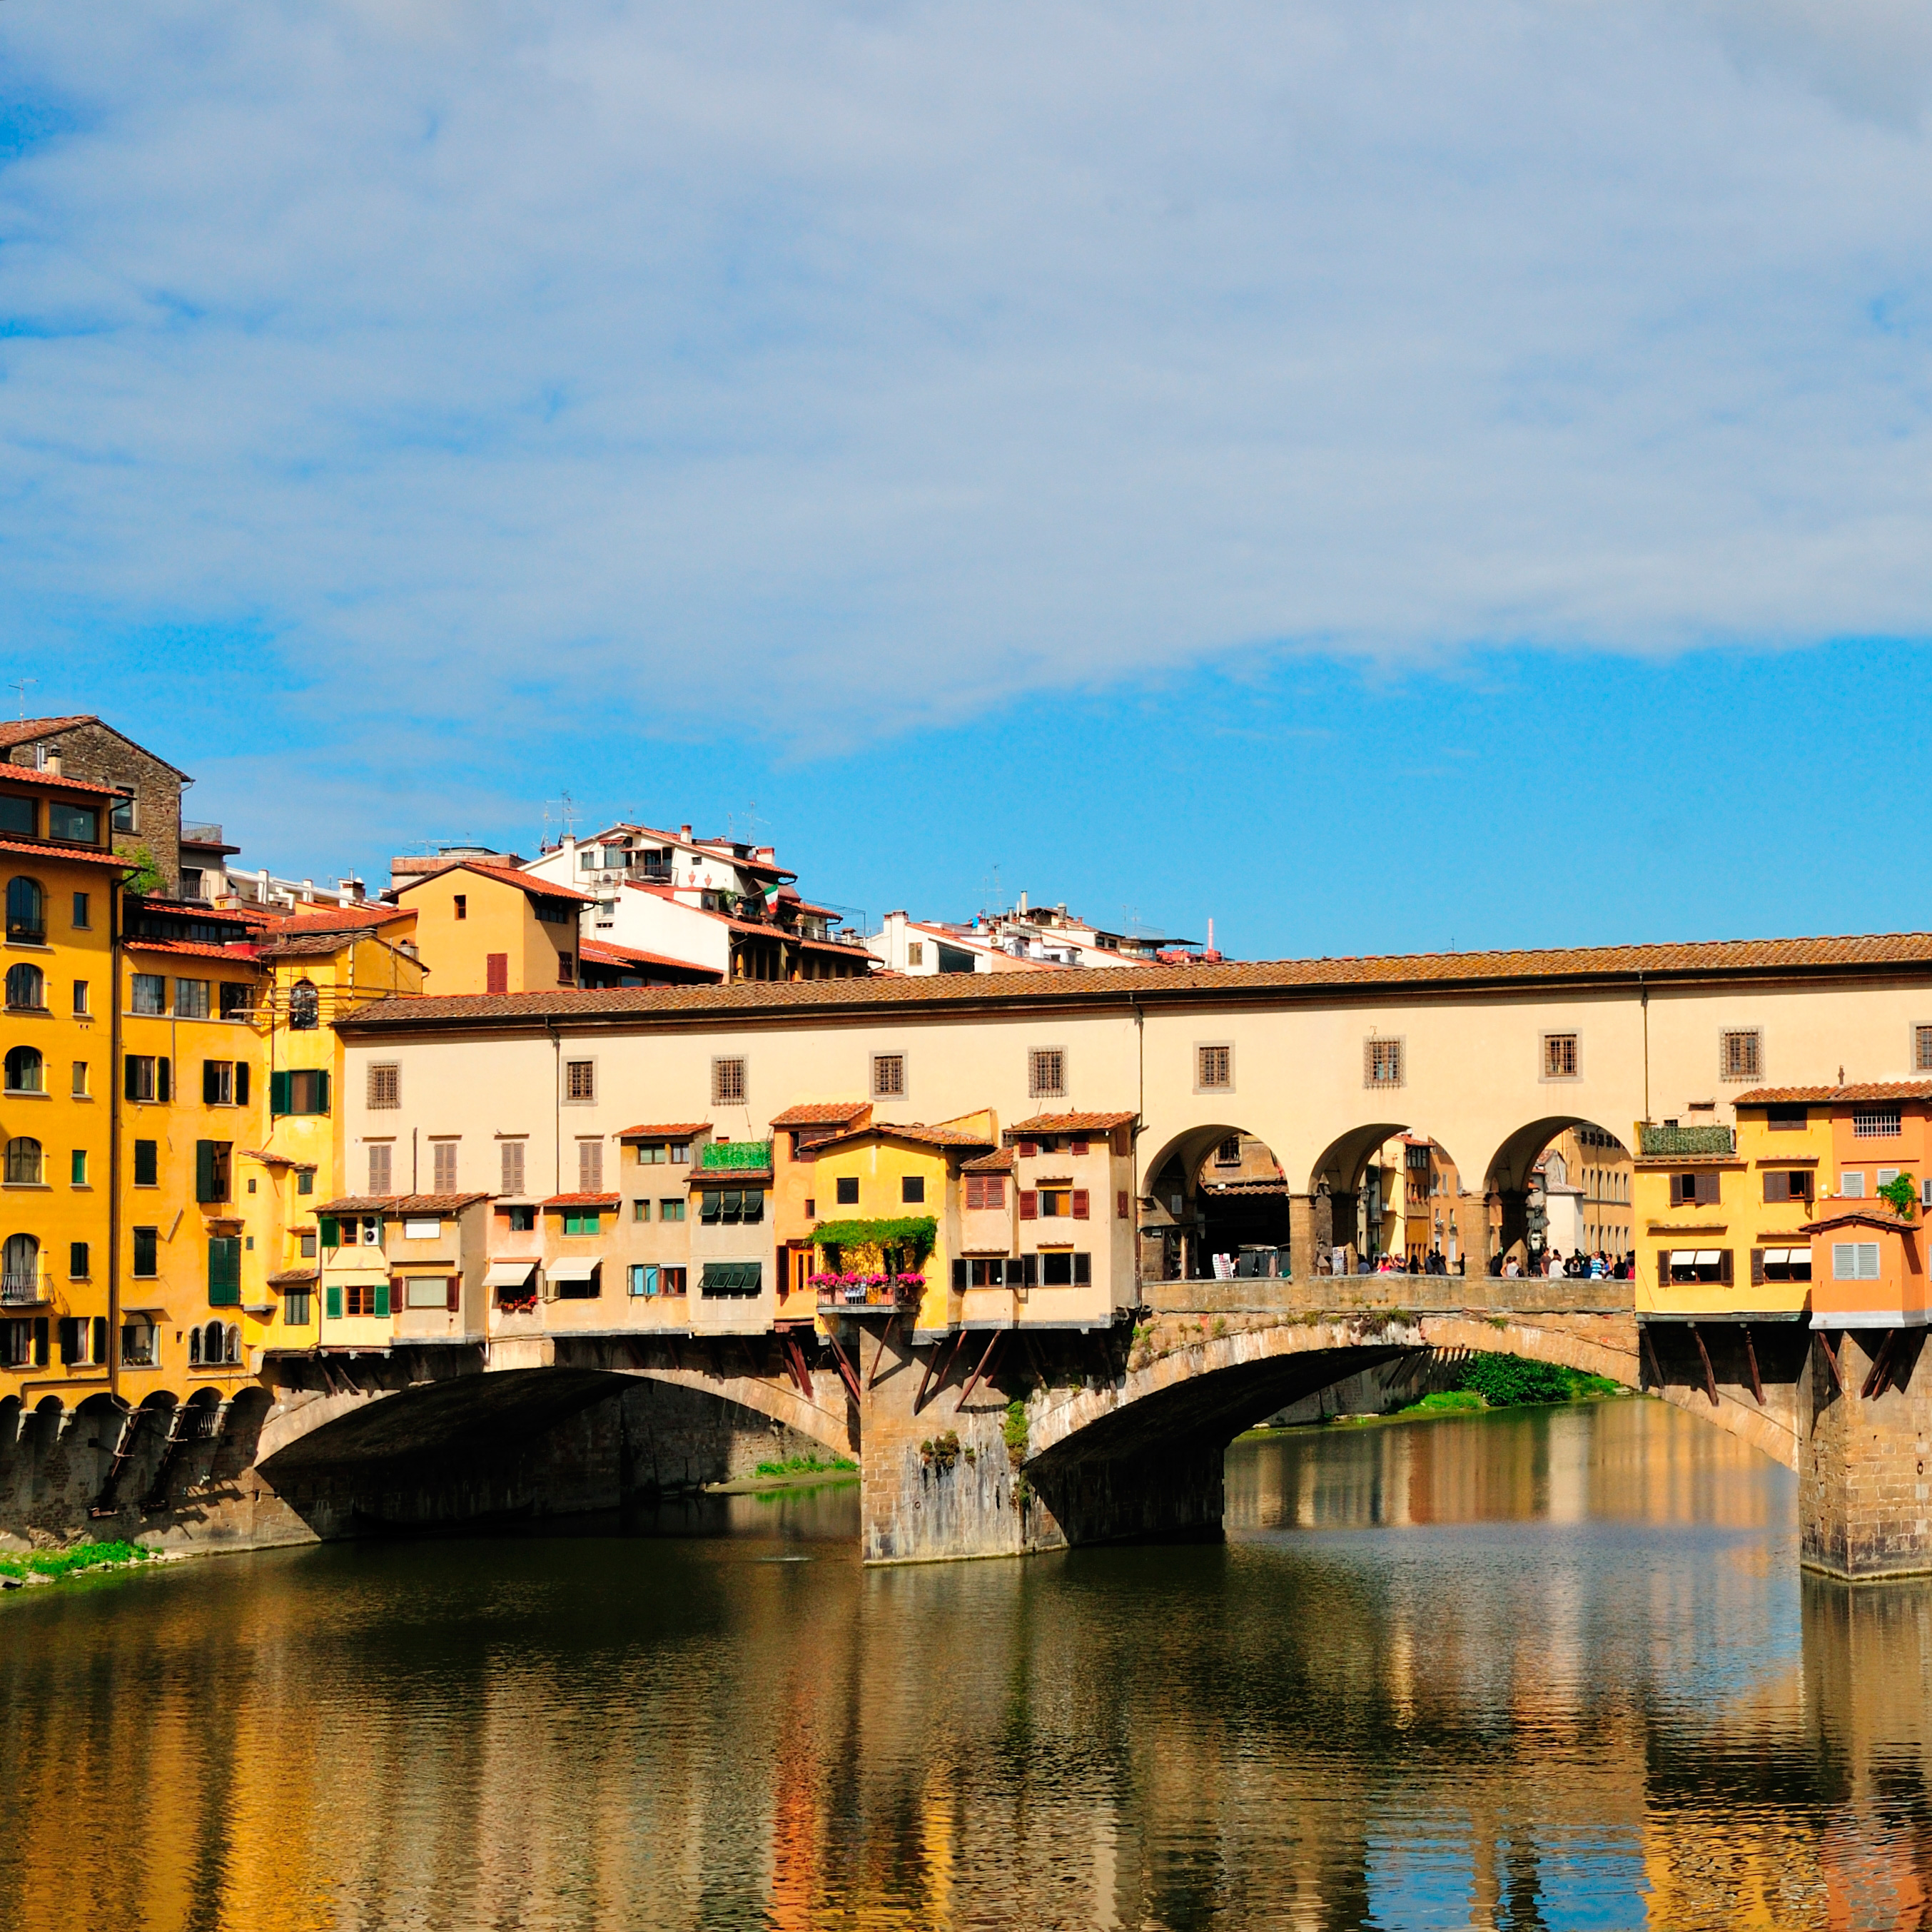 Florencia - Pisa (La Spezia)